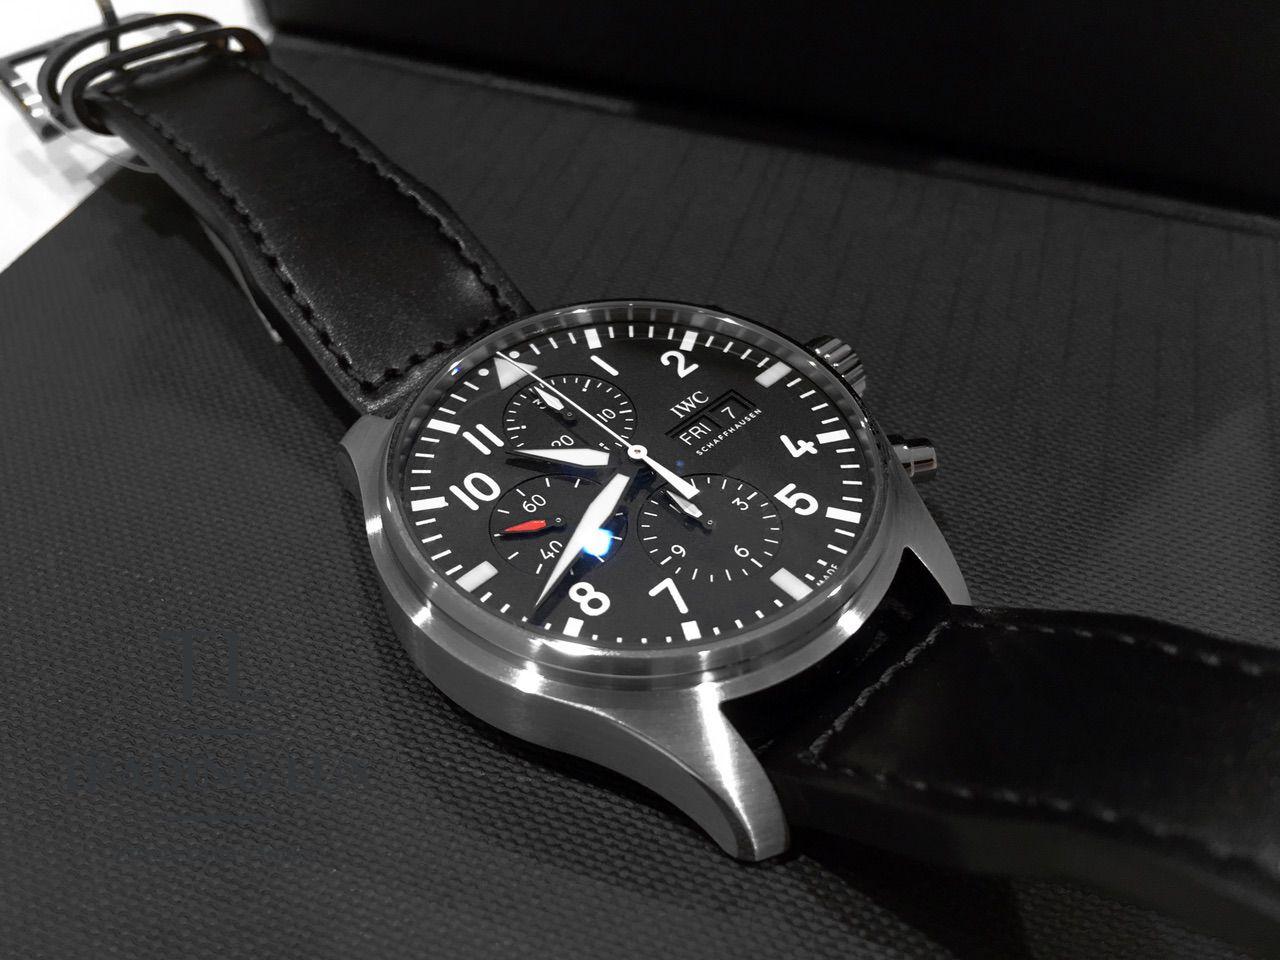 IWC-Pilot-Chronograph-IW377709-4